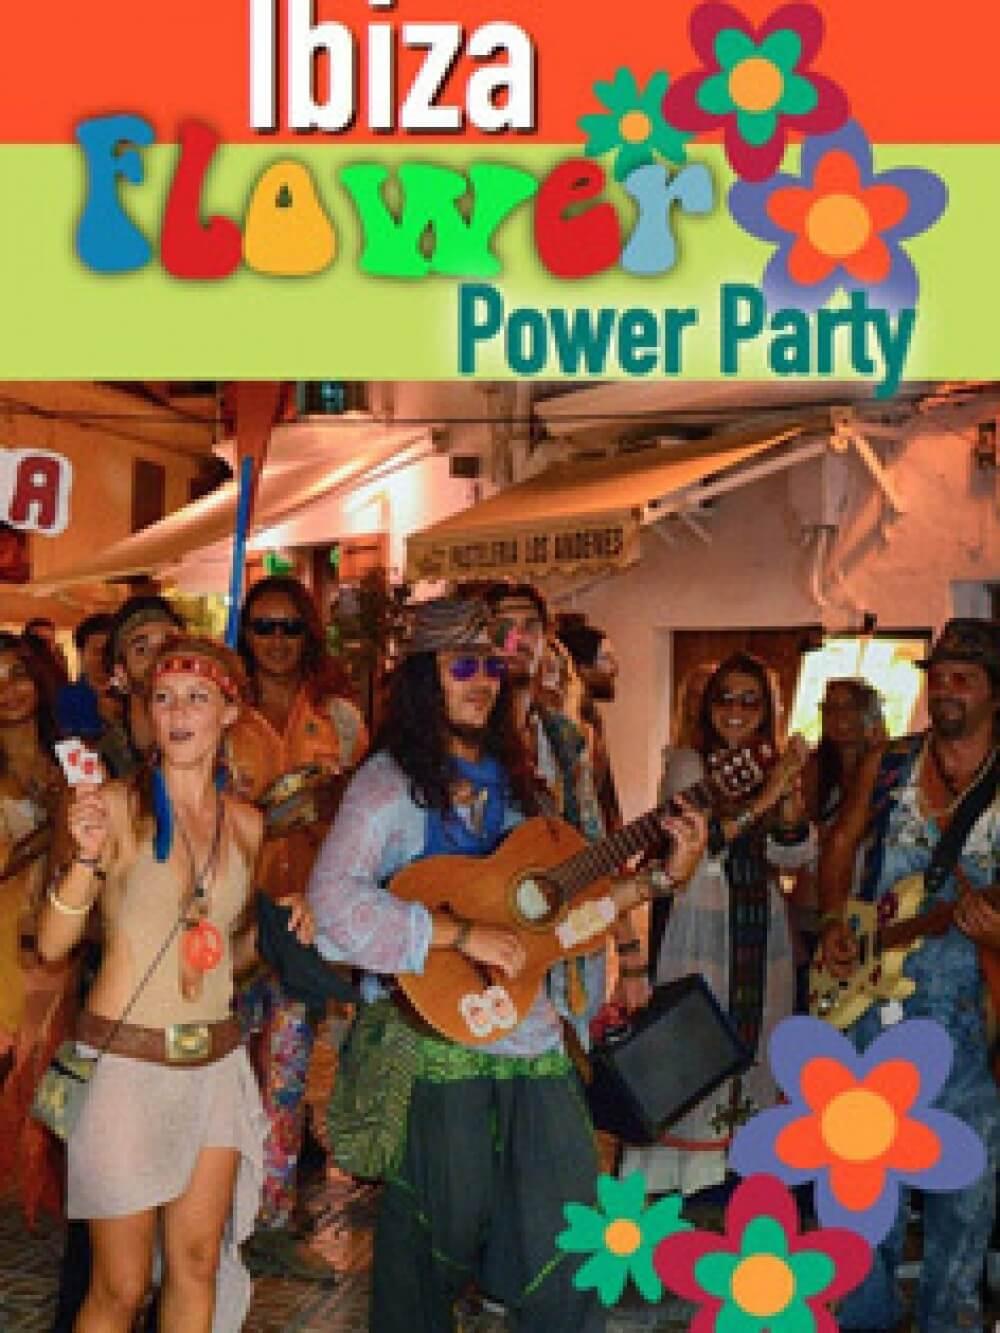 ibiza_flower_power_party_vertical_web